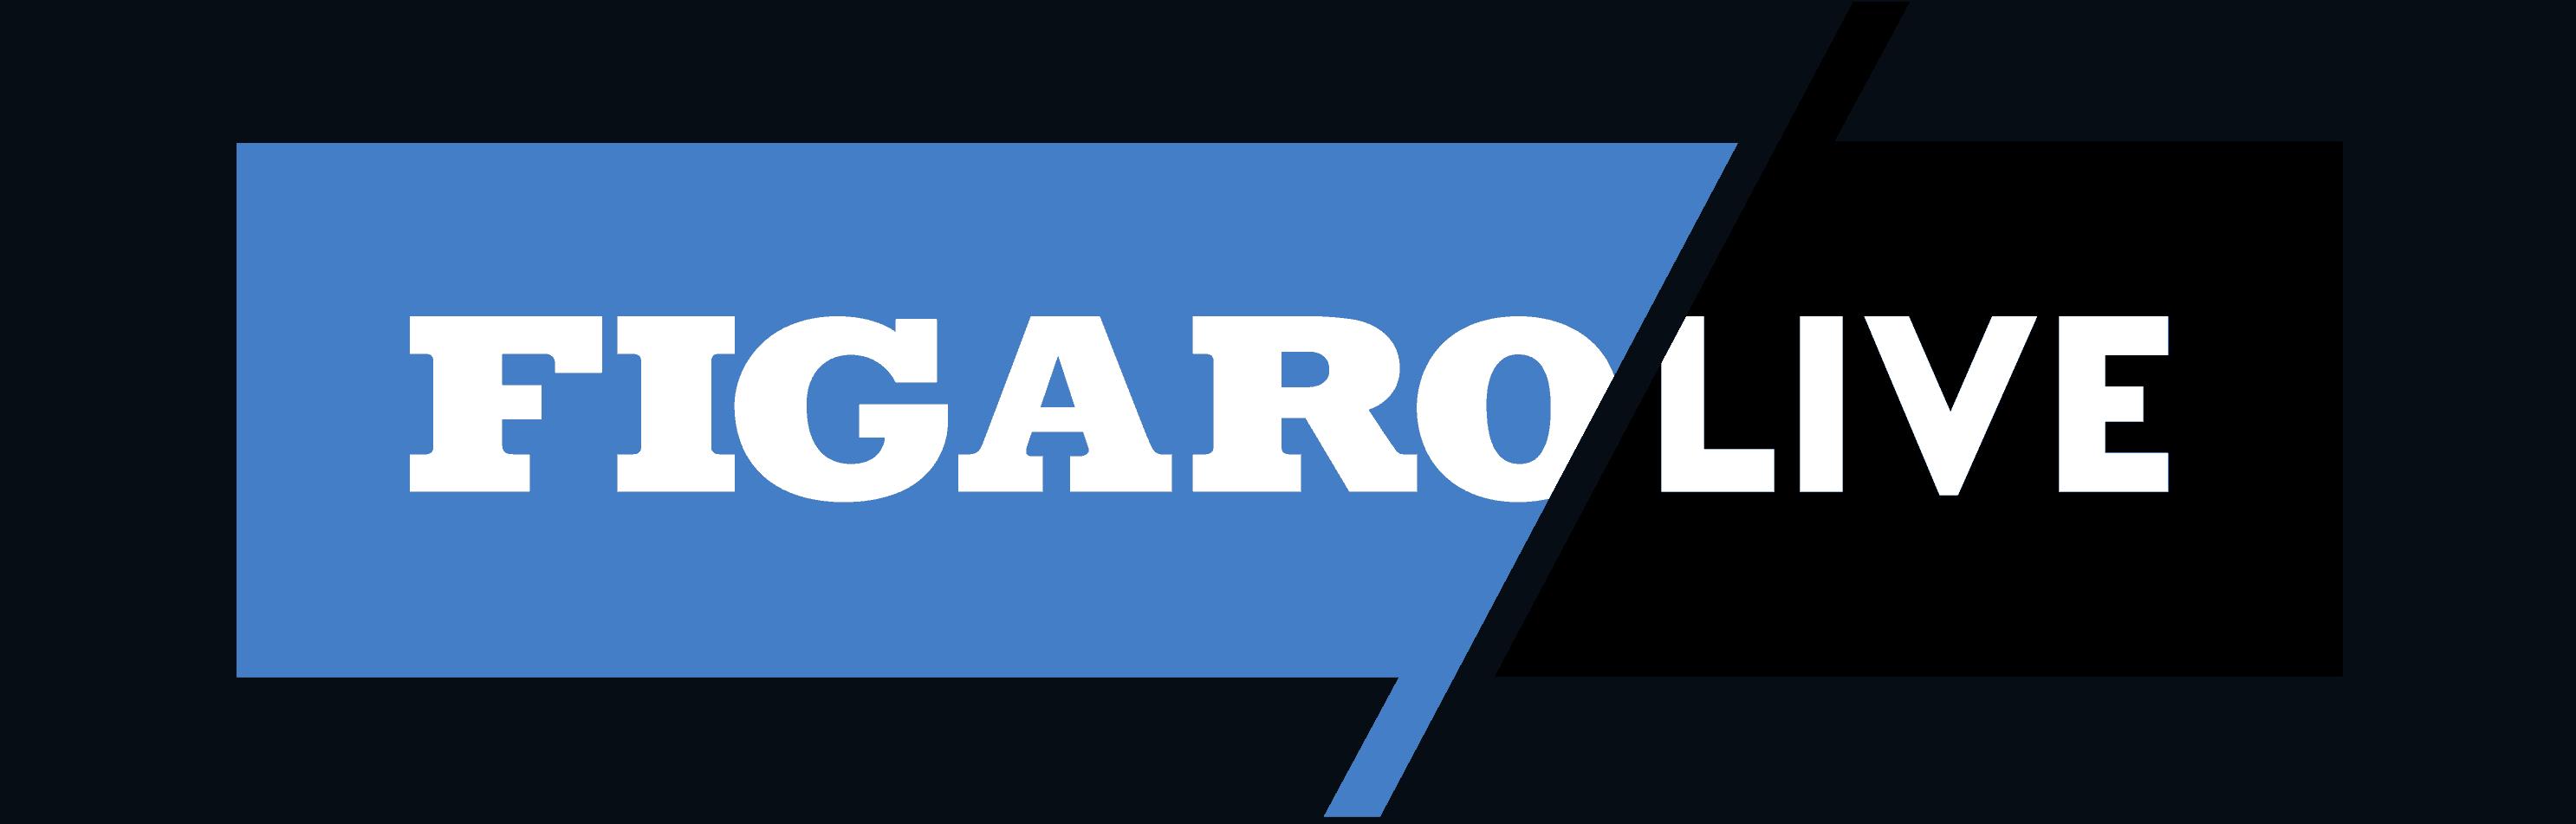 Figaro live